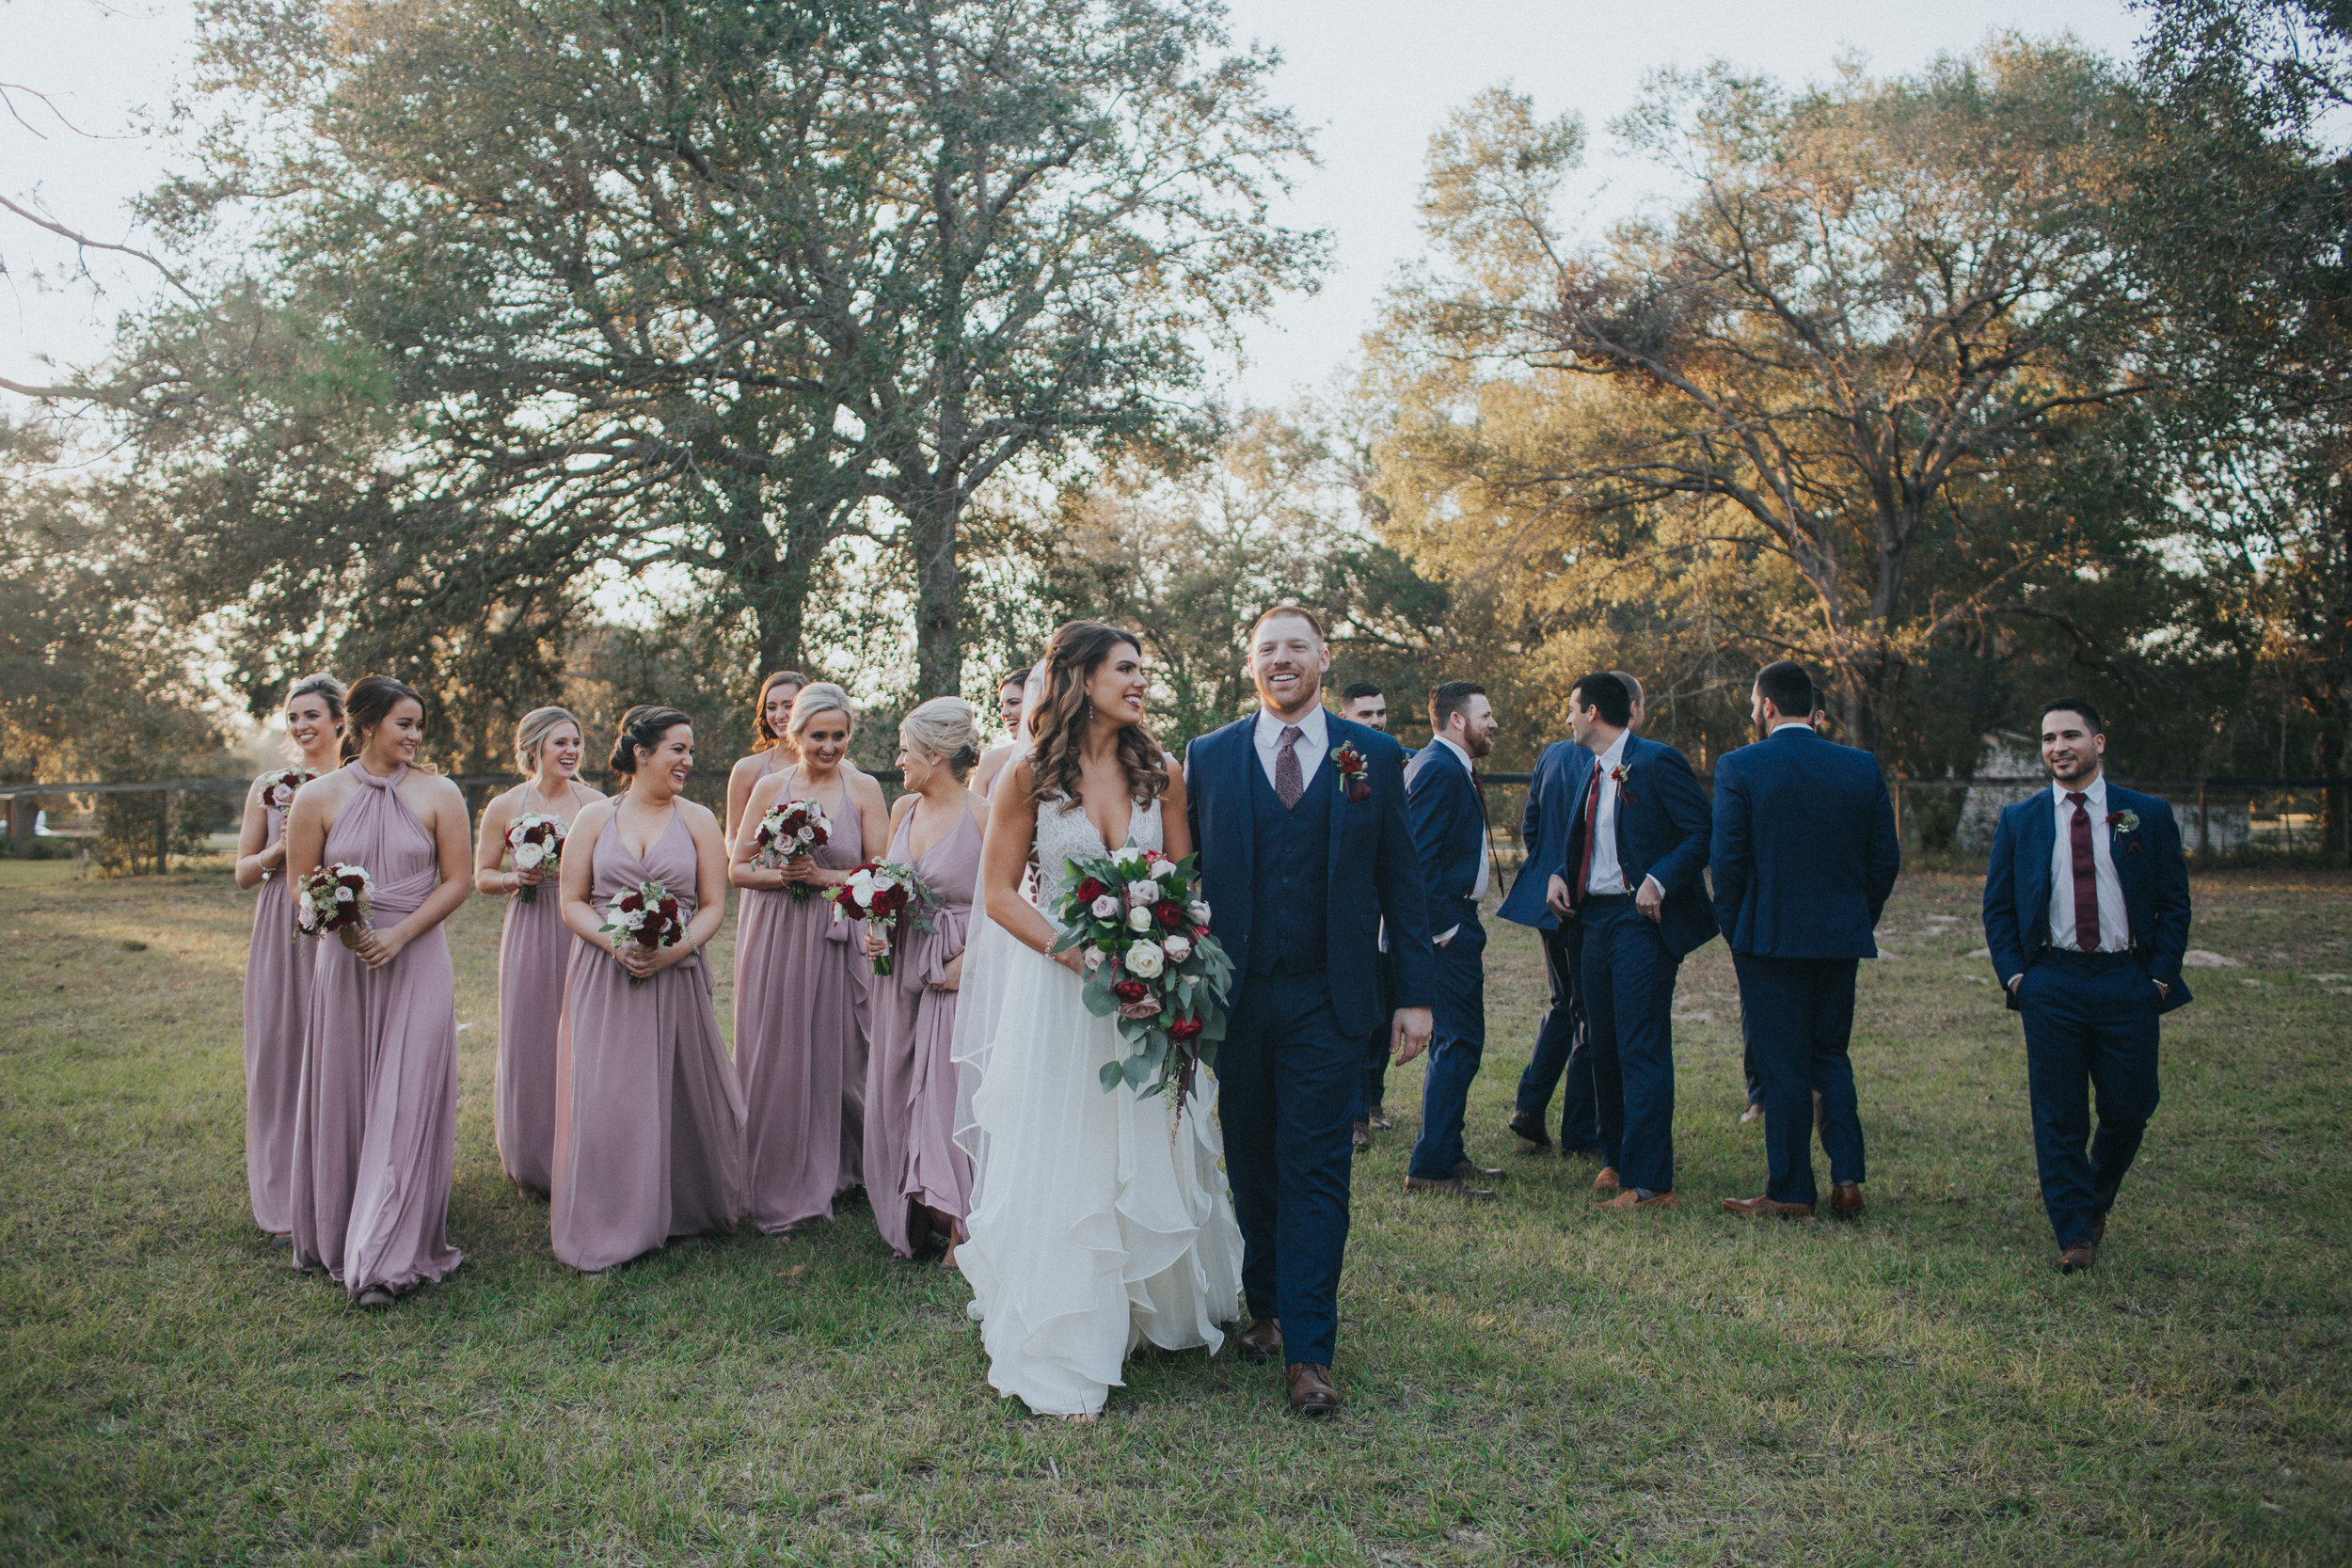 Wedding party at Arundel Estate